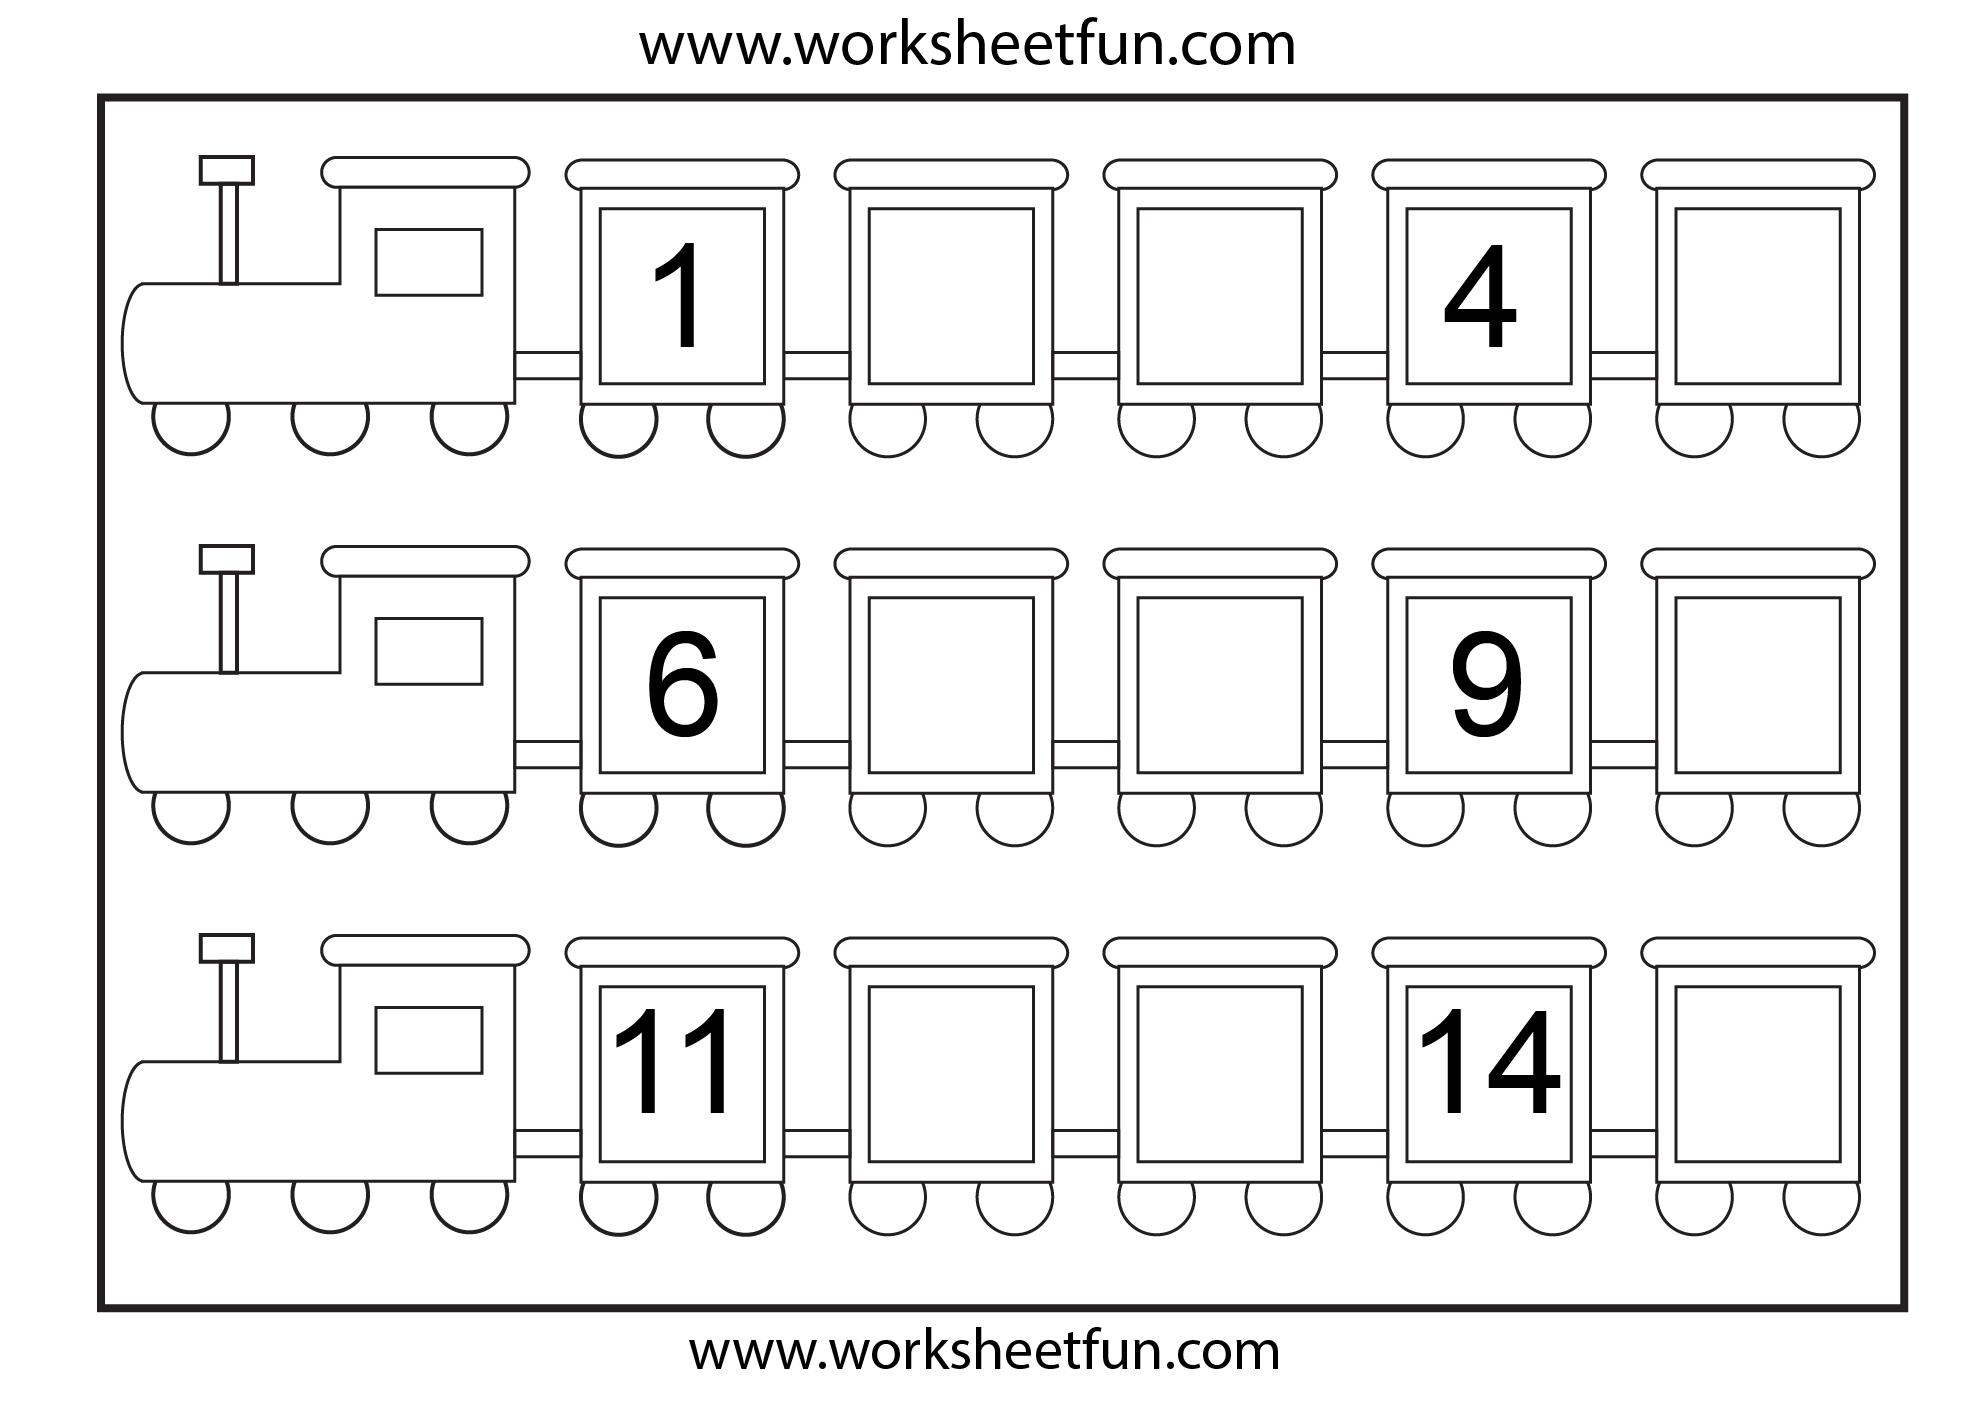 Preschool Missing Number Worksheets | Number Train – Missing Numbers - Free Printable Missing Number Worksheets